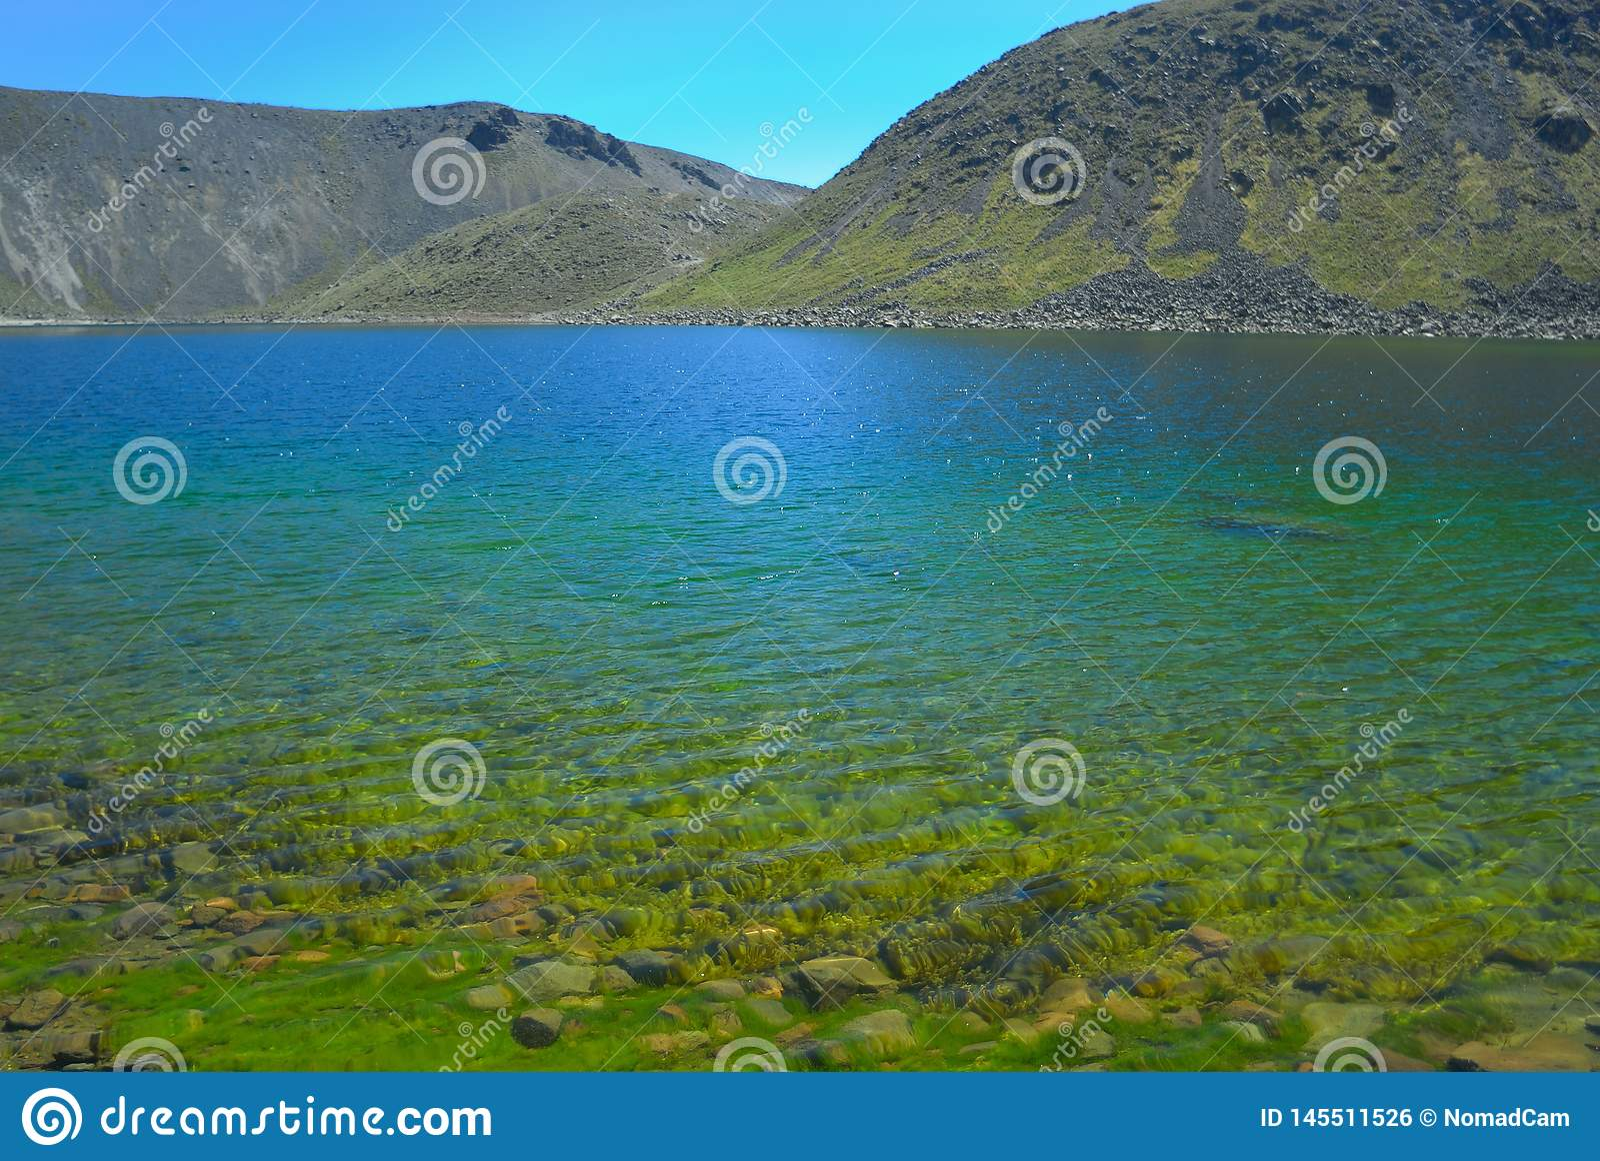 Lago Del Zol w Nevado De Toluca wulkanie Meksyk